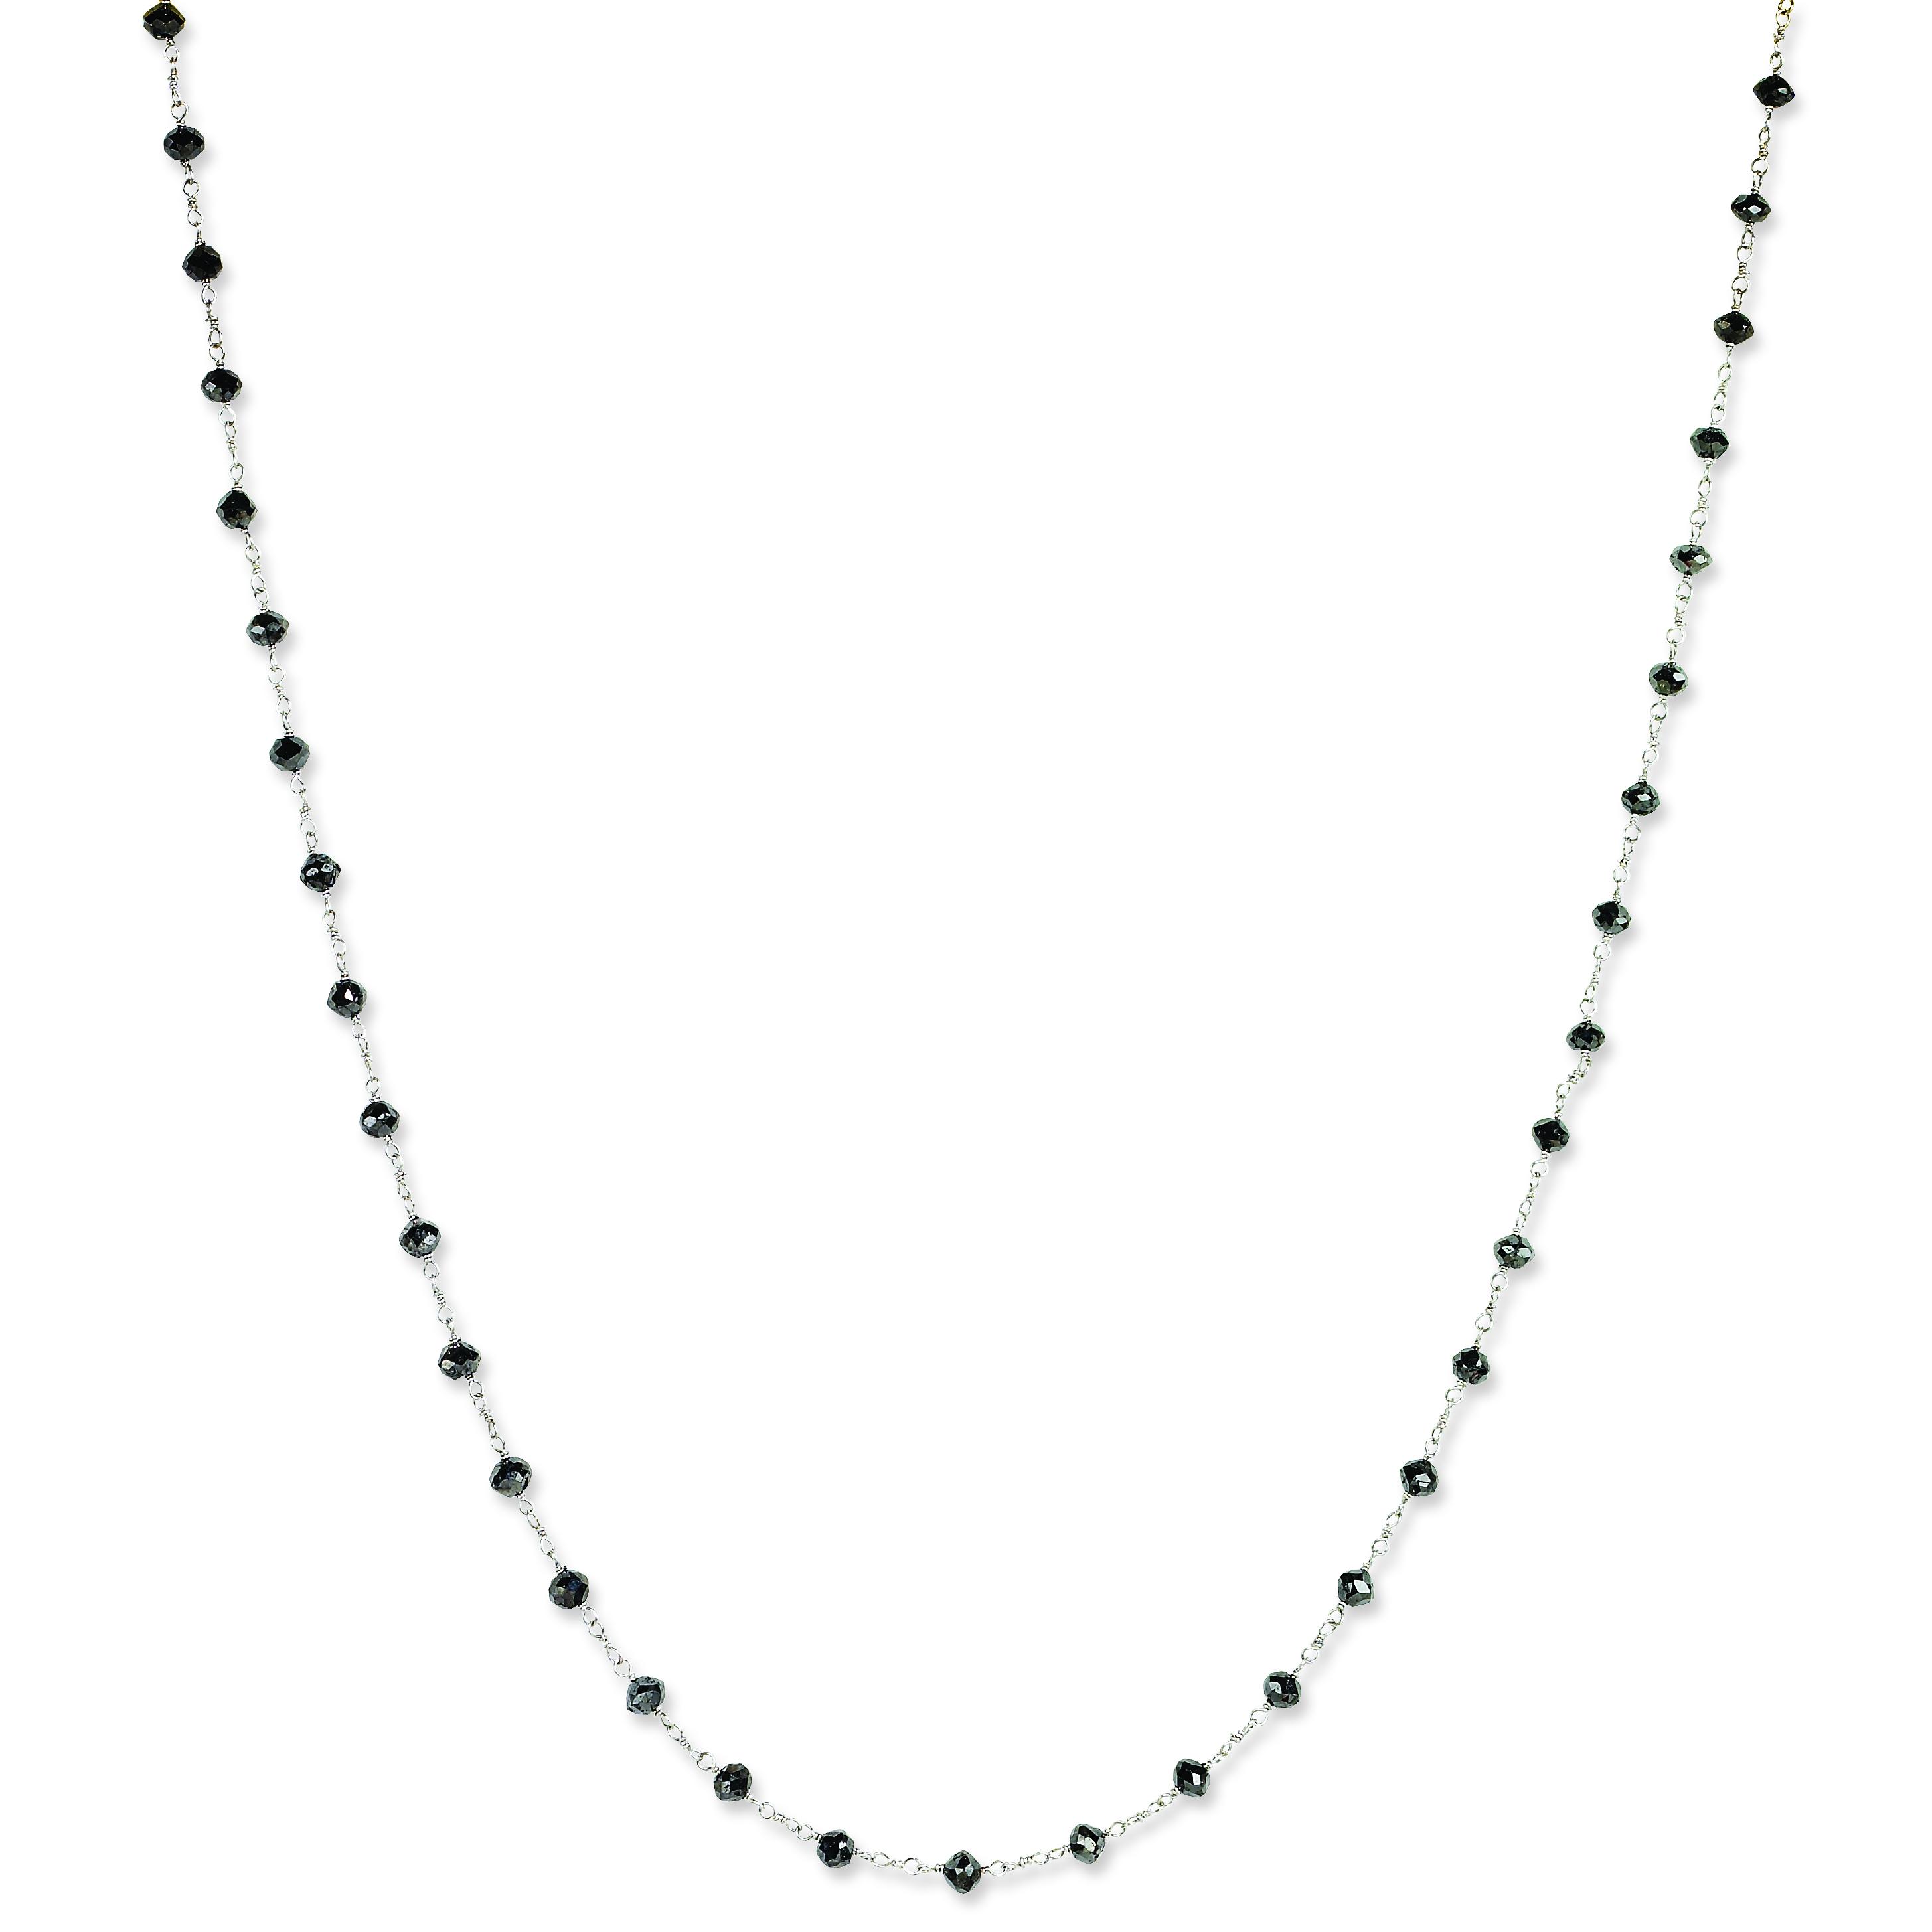 14k White Gold Black Diamond Briolette Necklace